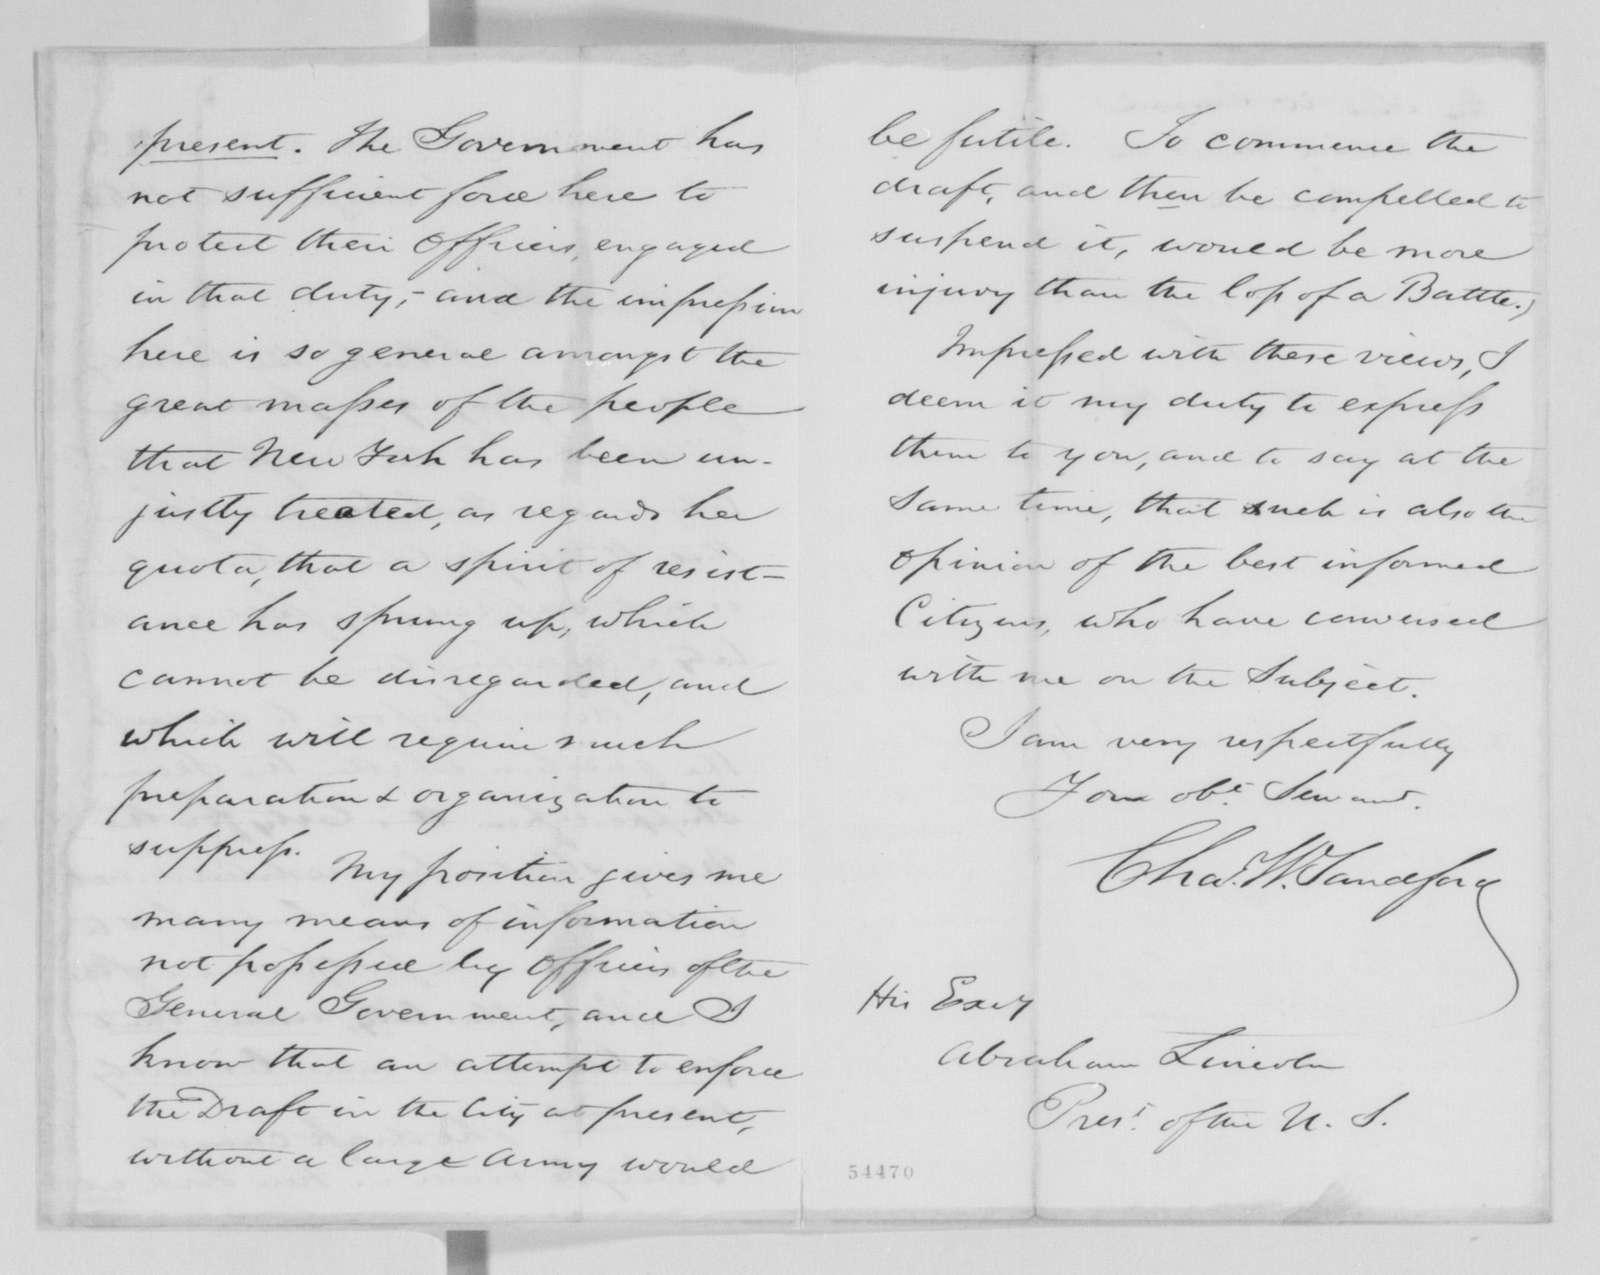 Edwin McMasters Stanton Papers: Correspondence, 1831-1870; 1864; 1864, Aug. 26-Oct. 31